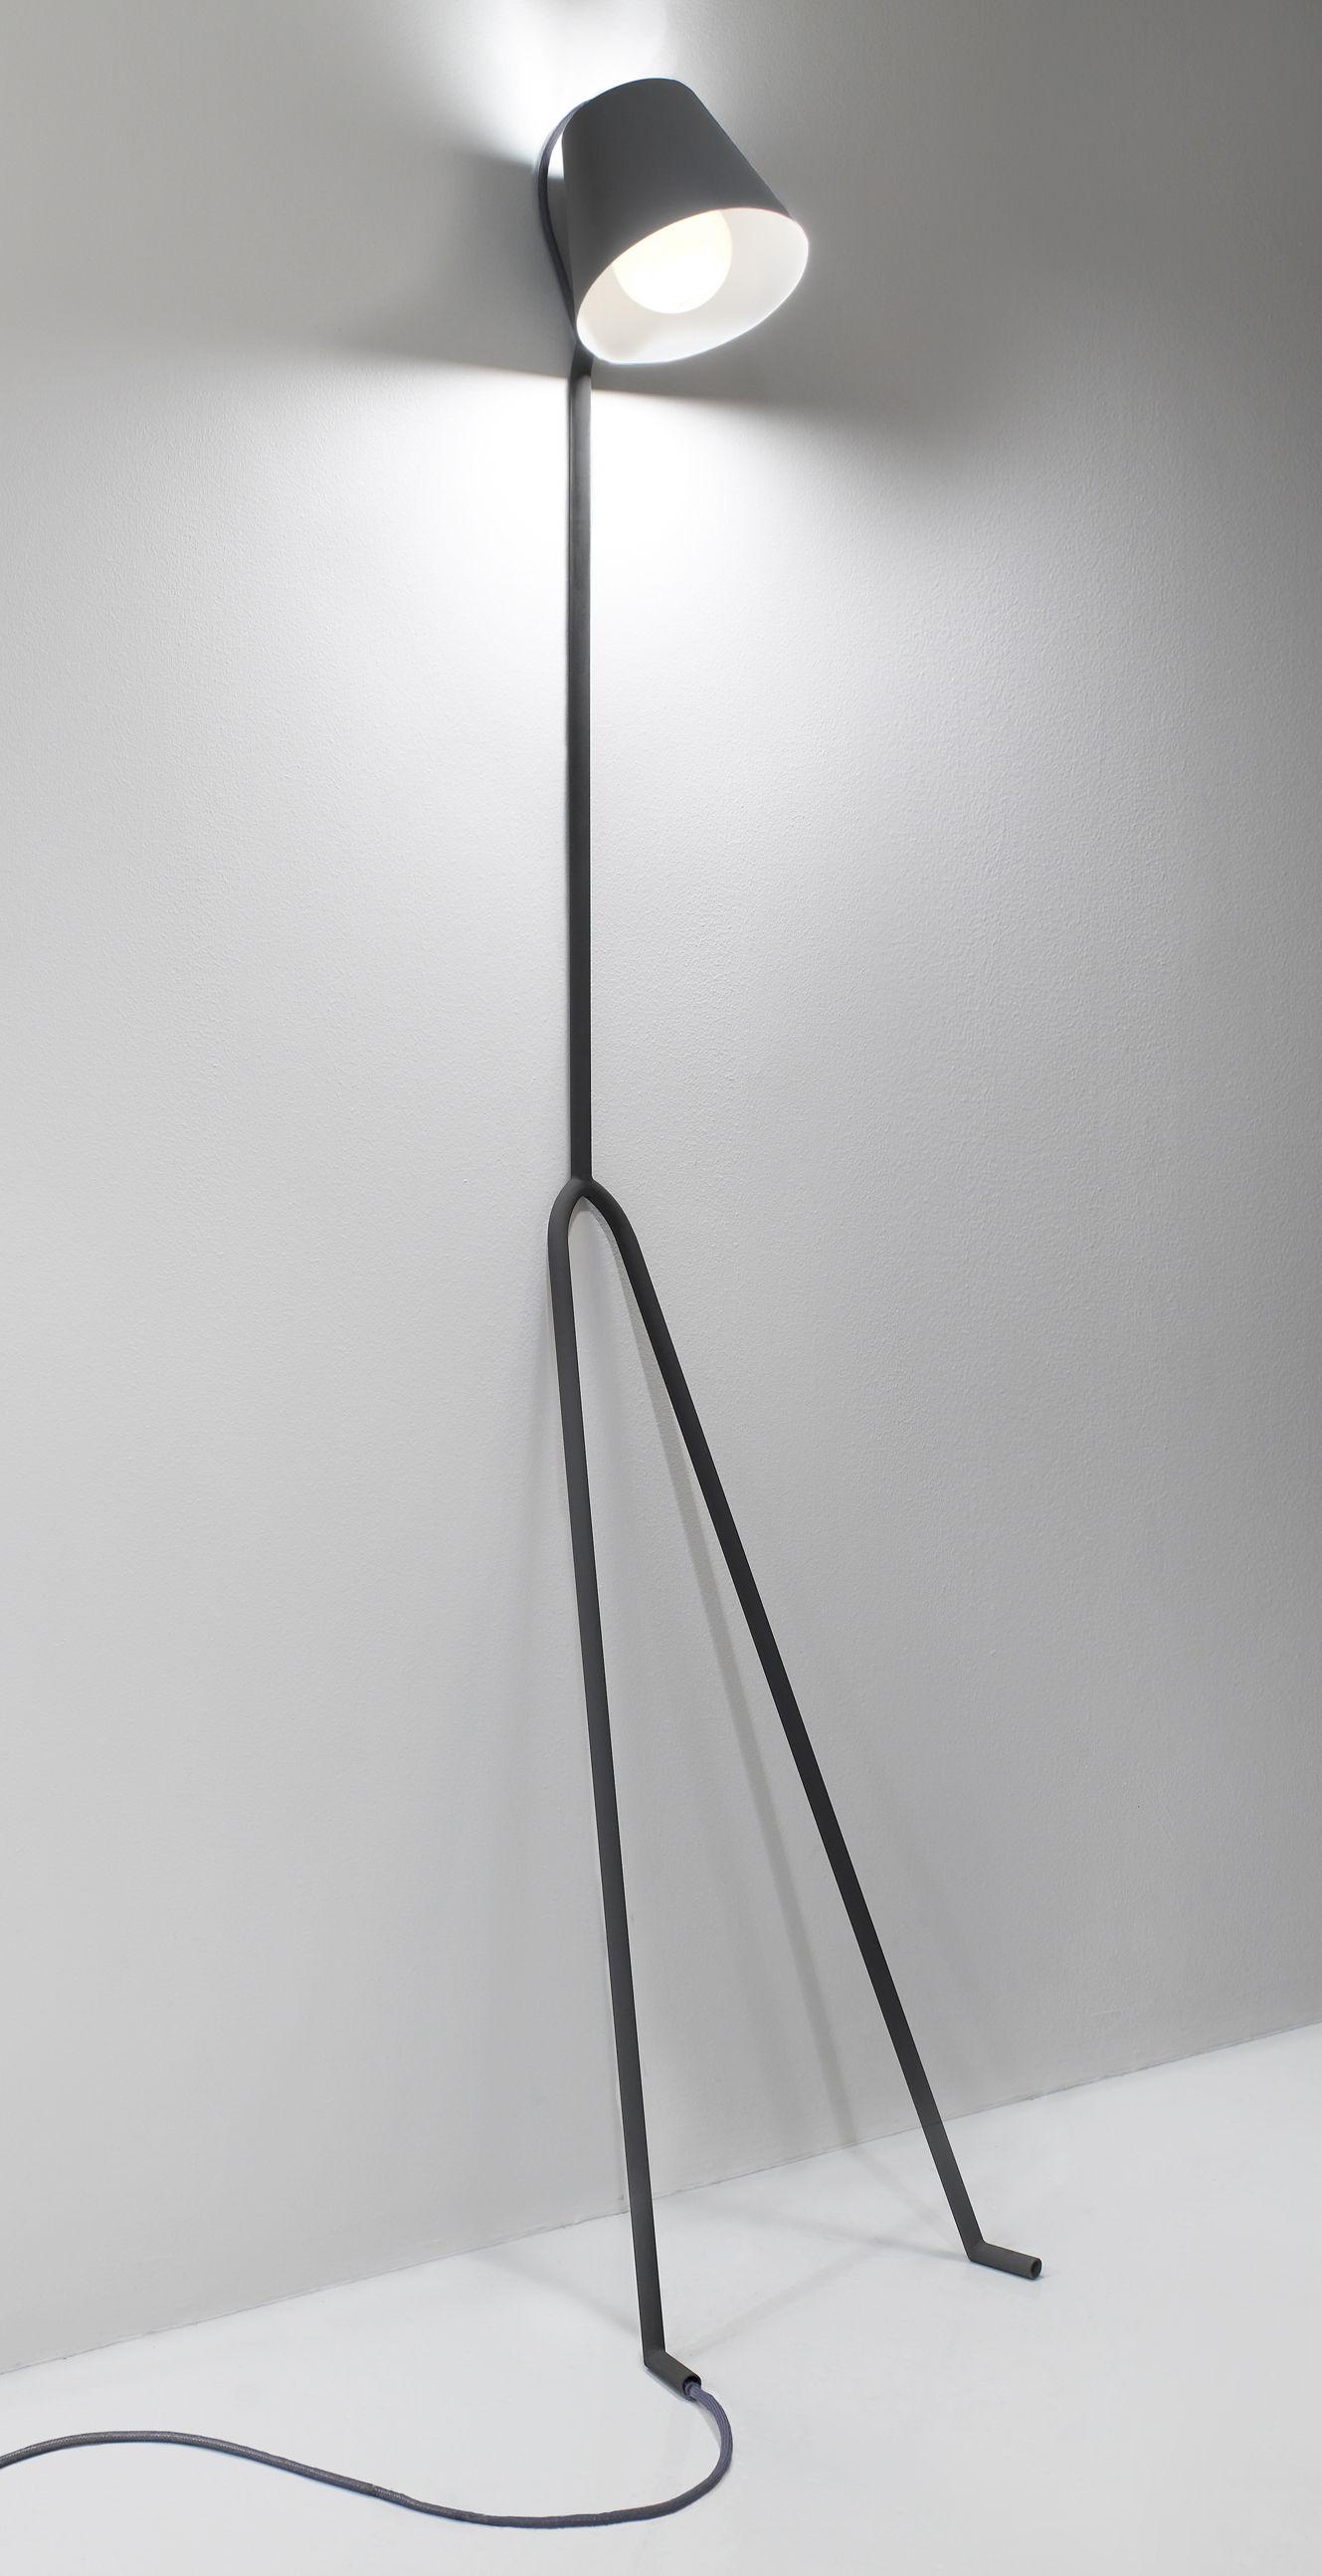 lampadaire manana lamp - design house stockholm